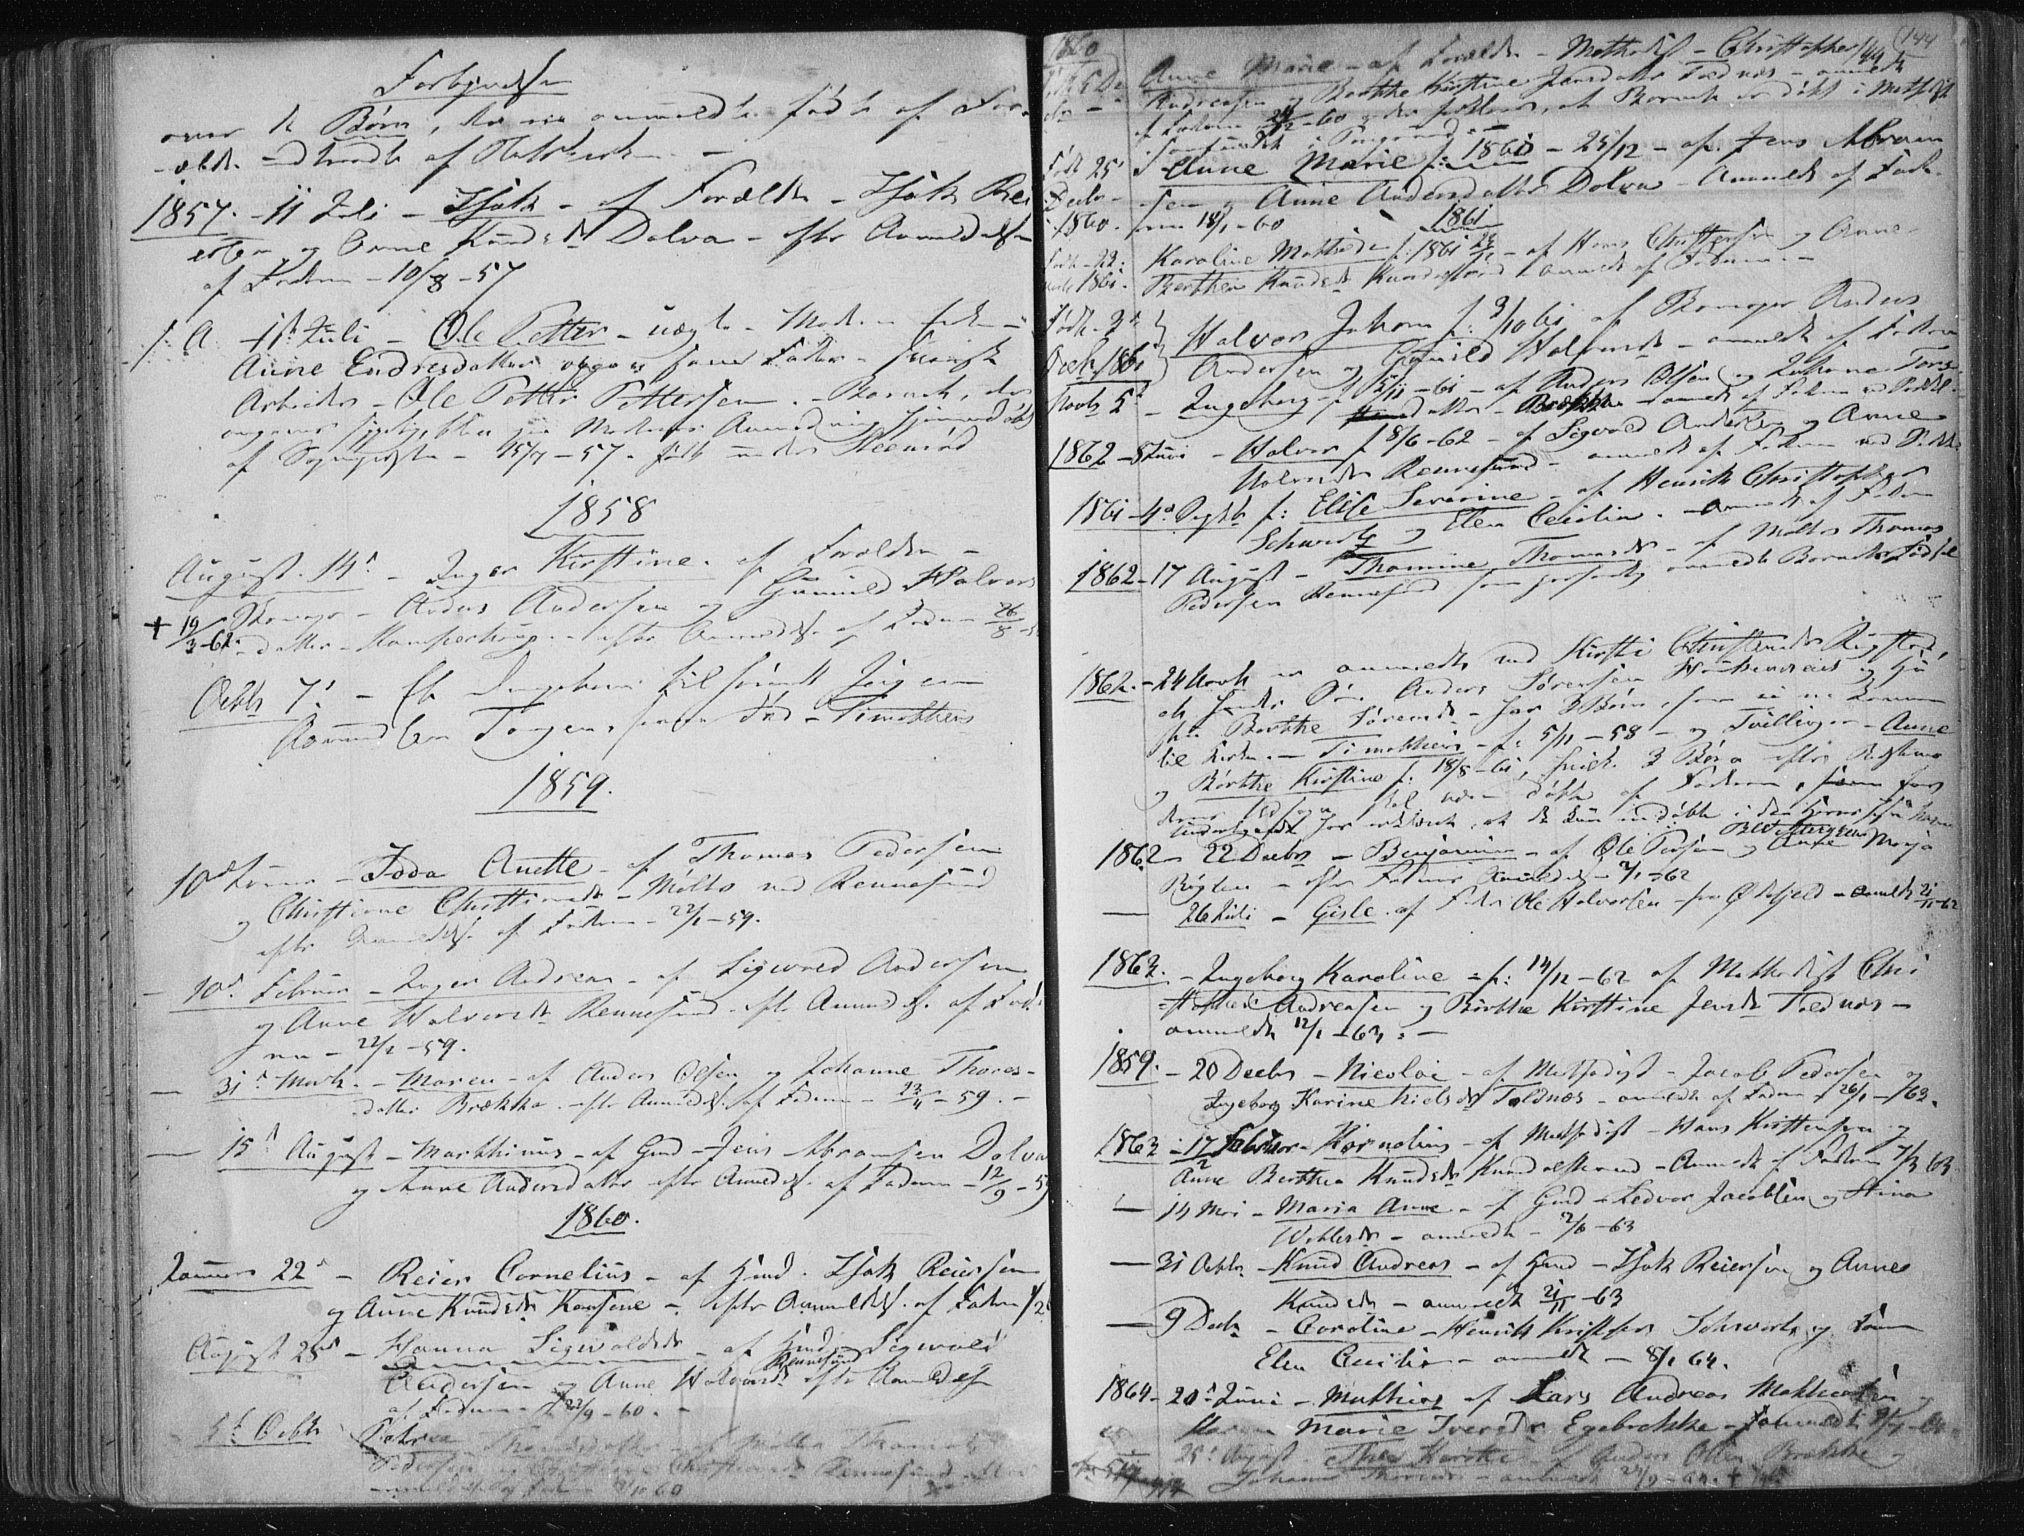 SAKO, Solum kirkebøker, F/Fa/L0007: Ministerialbok nr. I 7, 1856-1864, s. 144